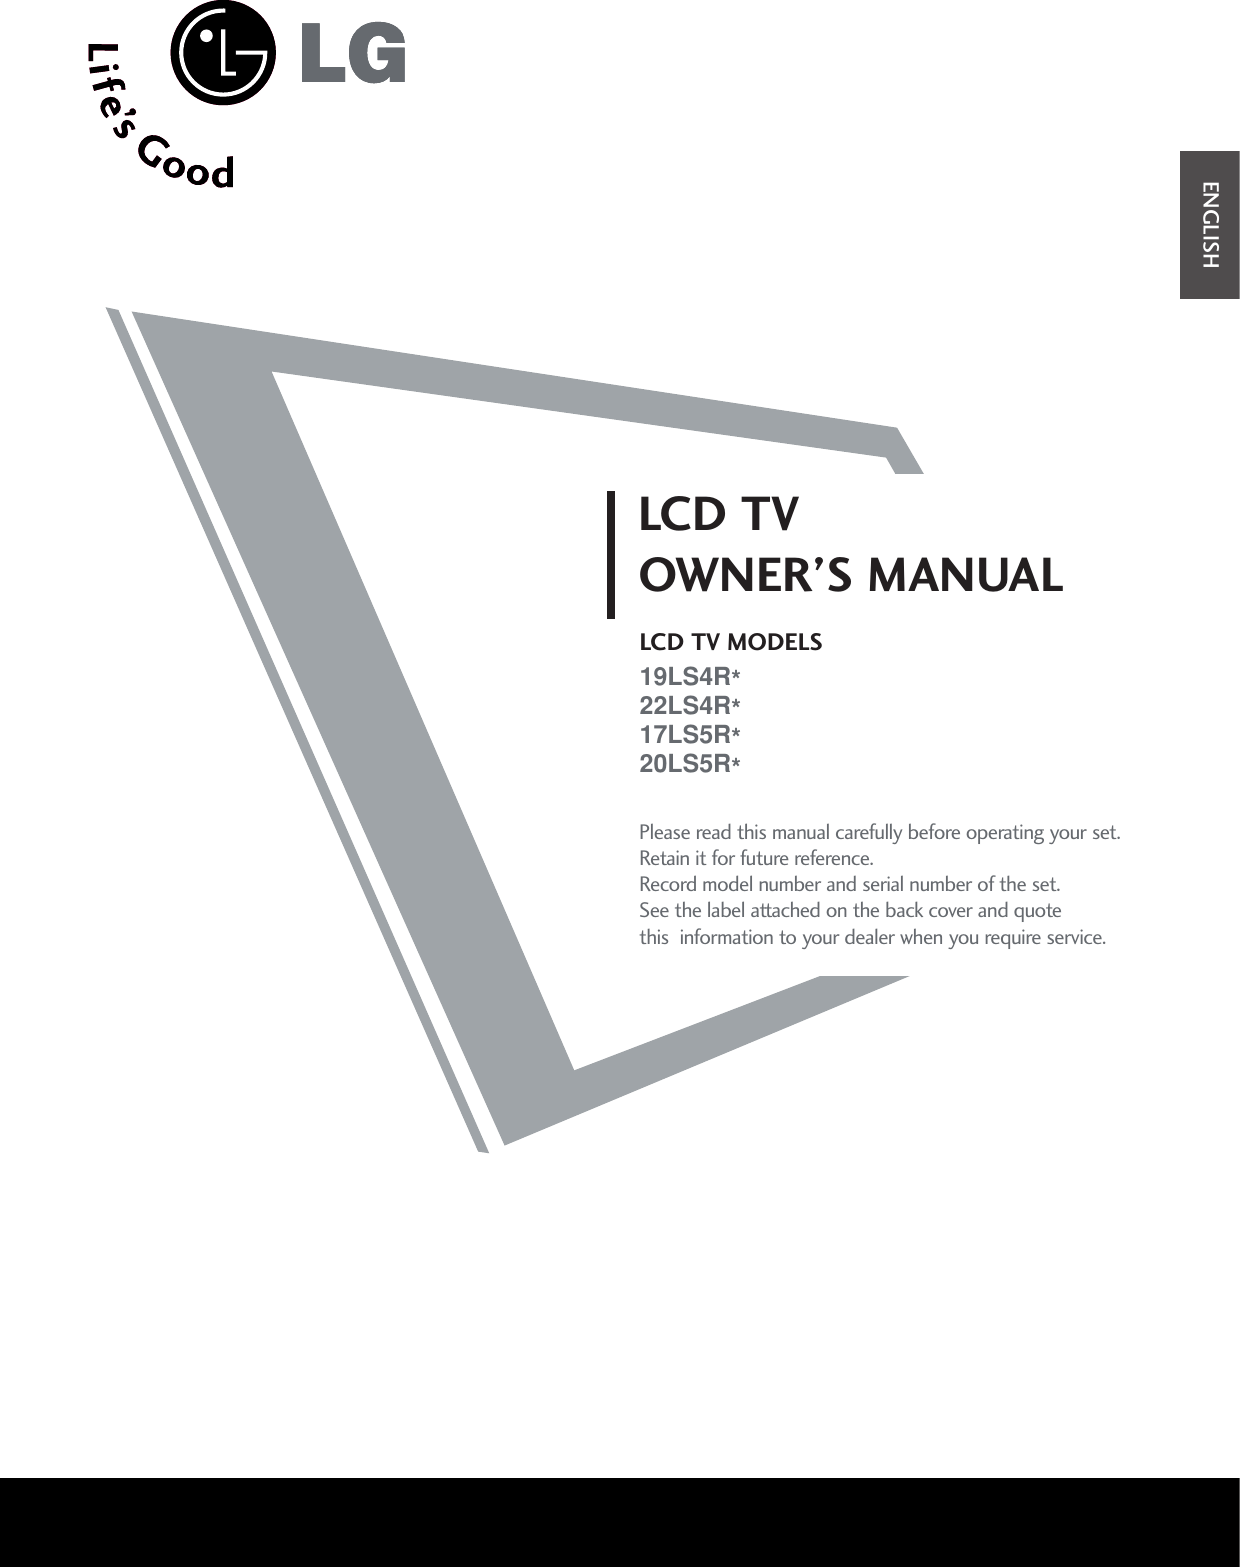 Lg 22Ls4R Owner S Manual SAC30033604en_1_070416